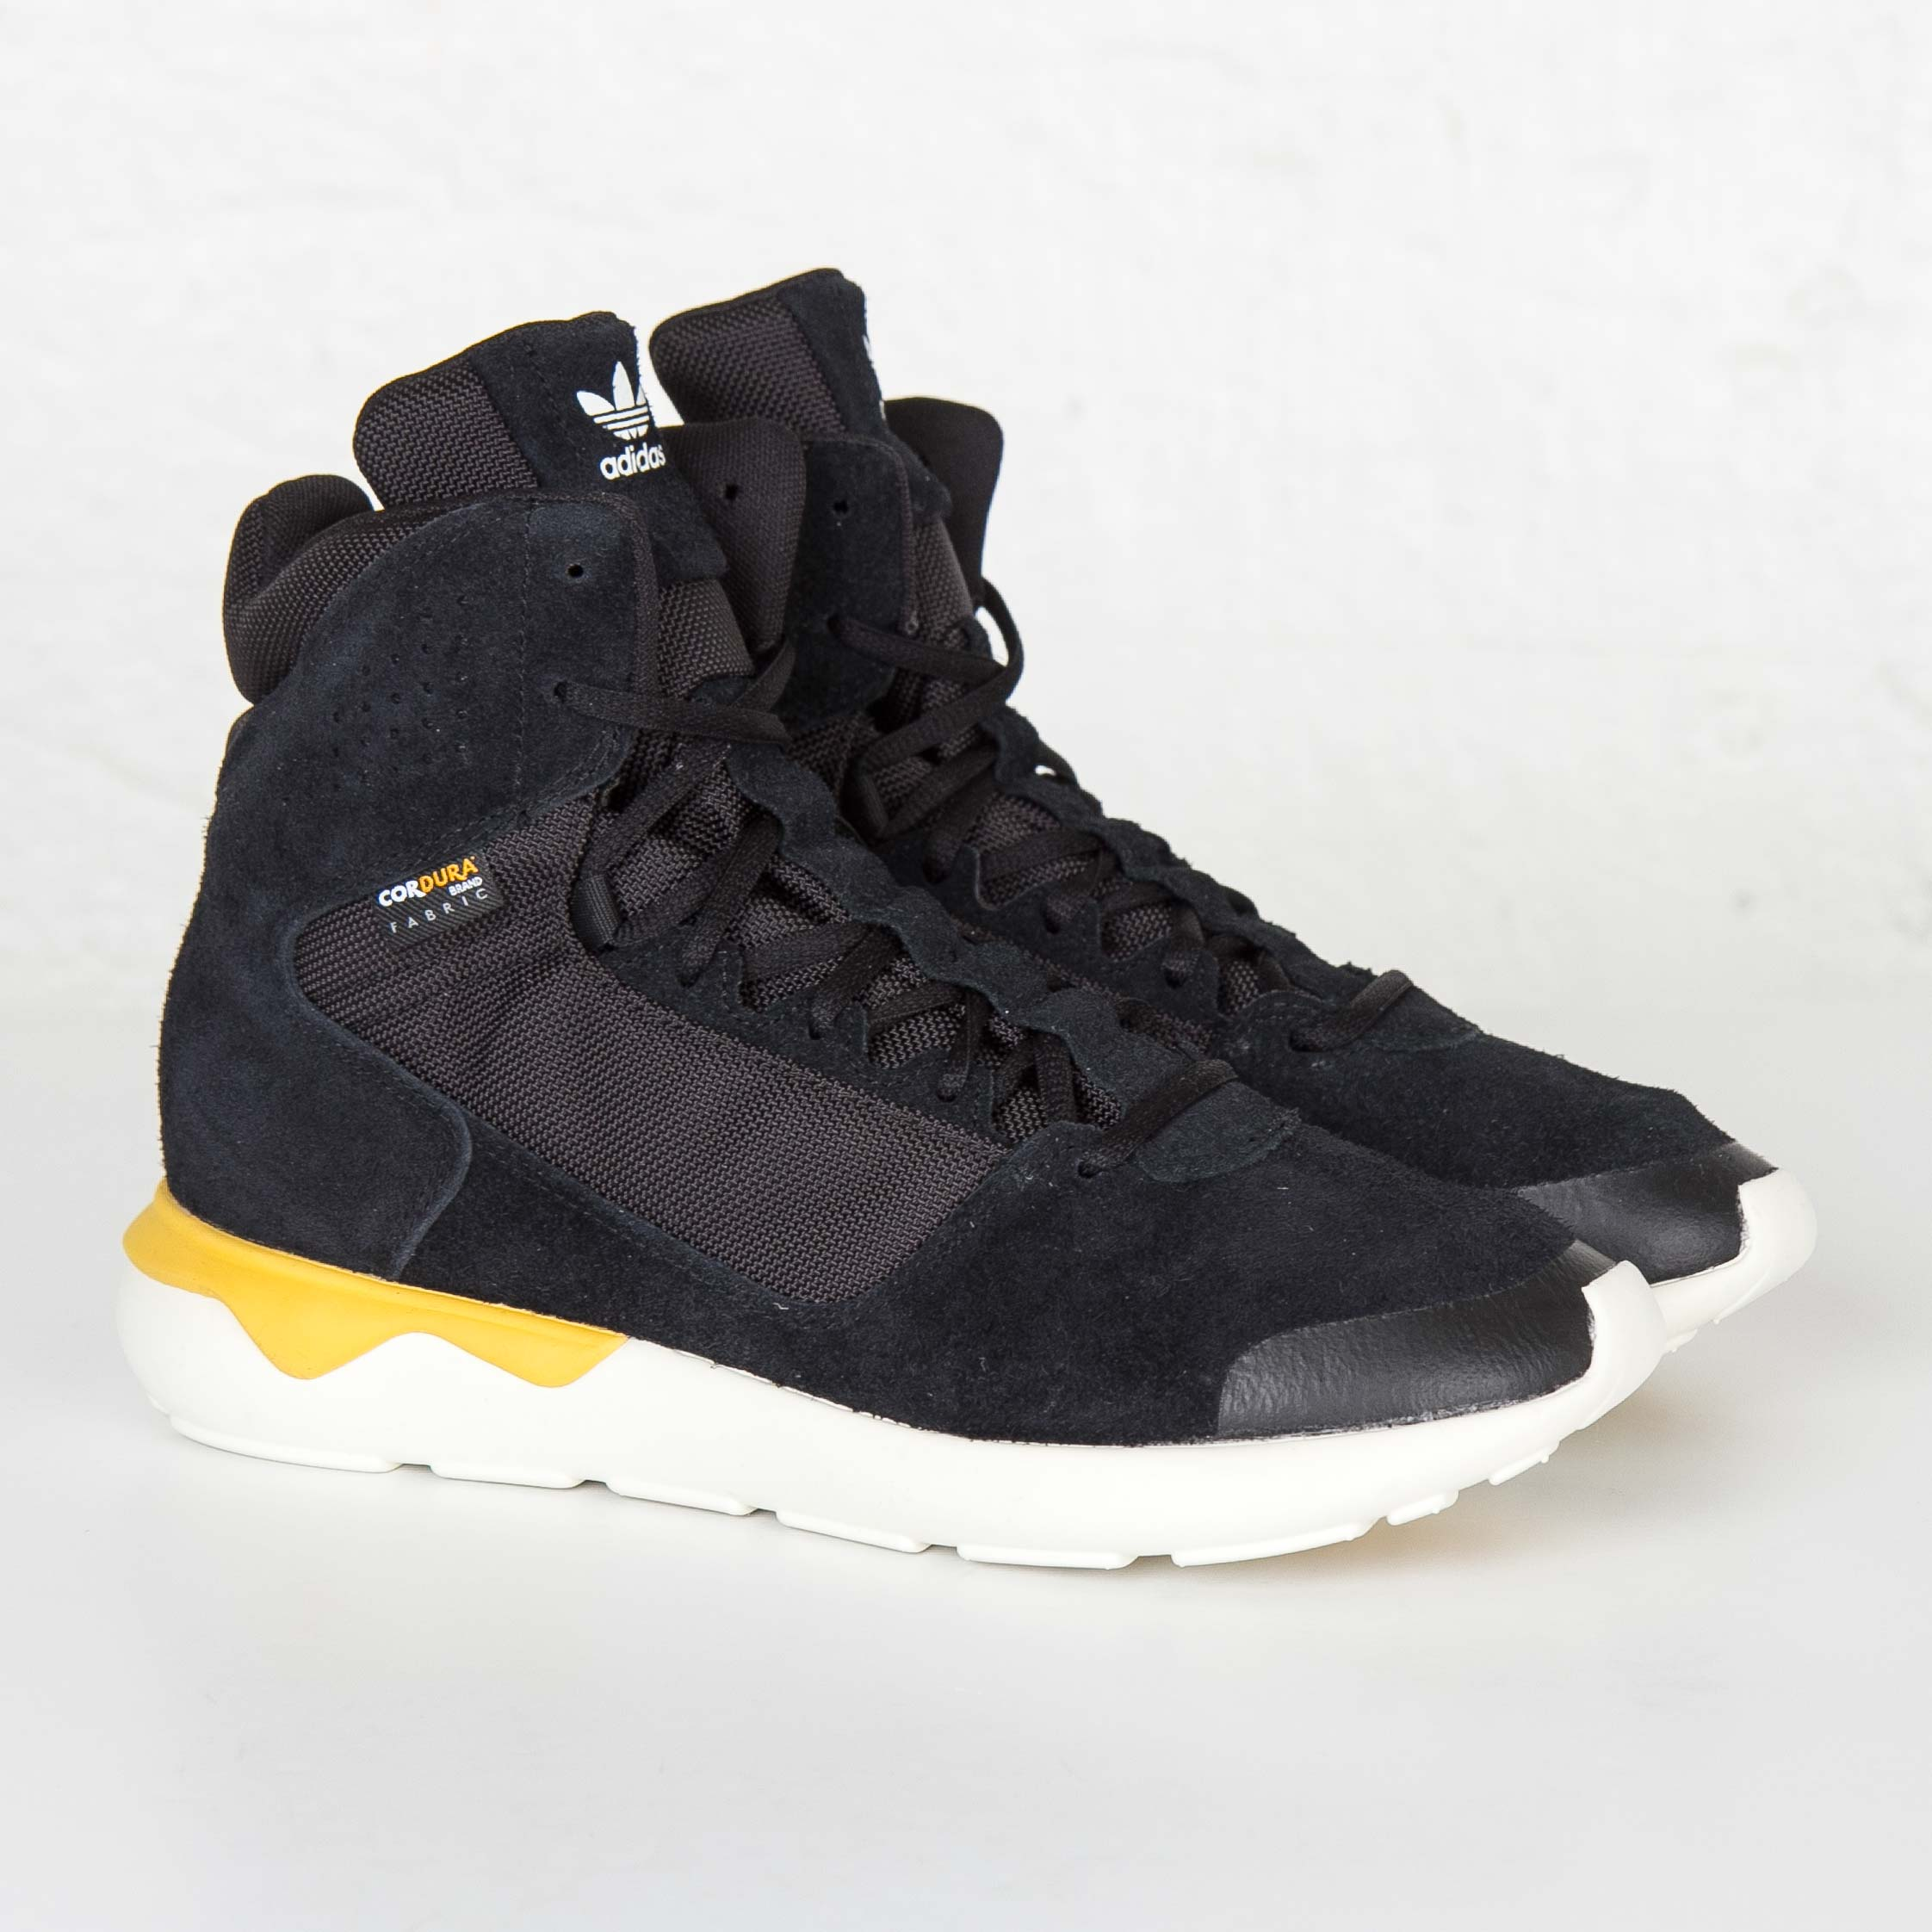 adidas Tubular GSG9 - S82516 - Sneakersnstuff